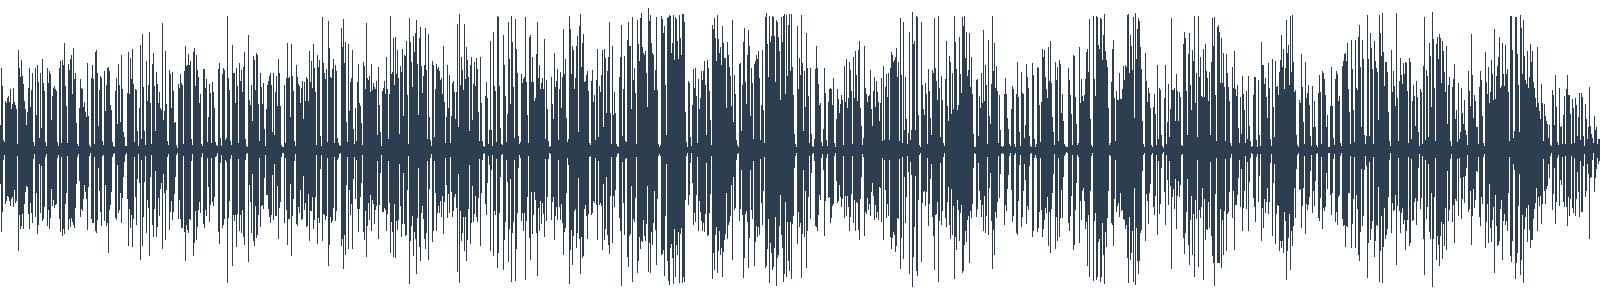 Sila pátra Aquinasa waveform